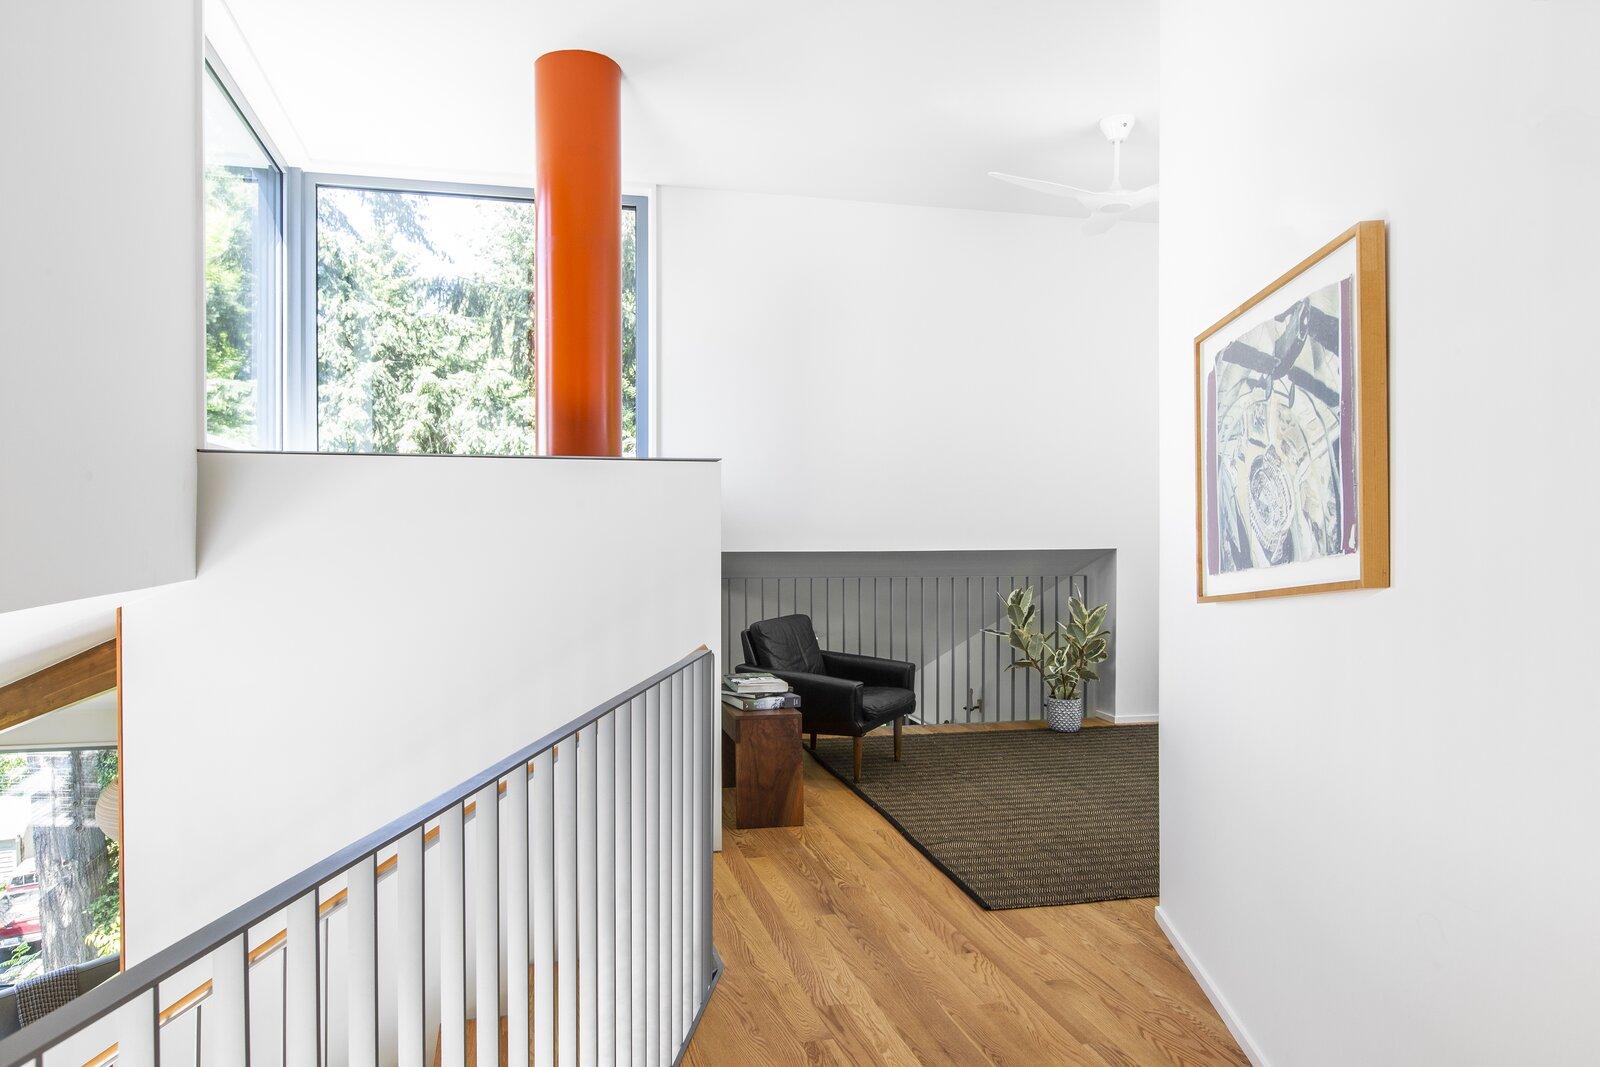 Me-Kwa-Mooks Net-Zero by SHED Architecture & Design